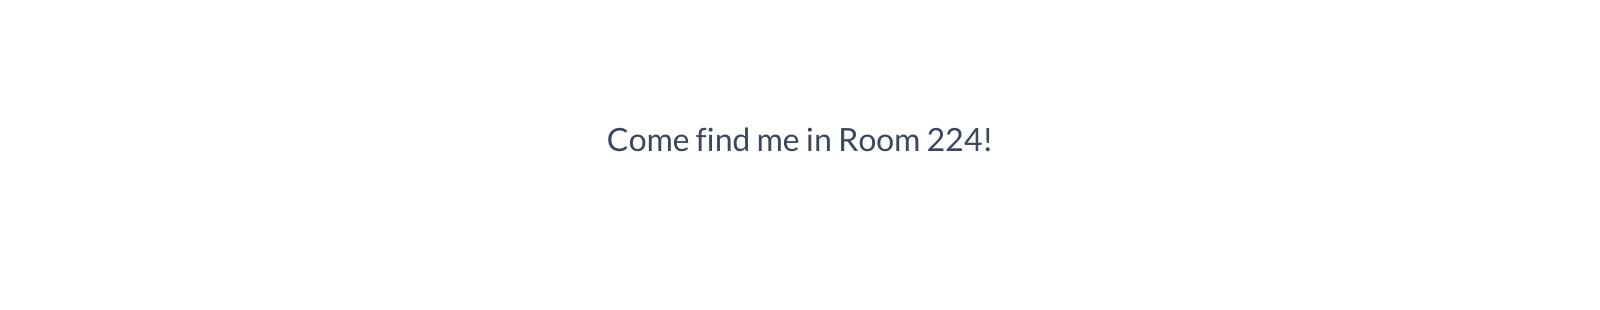 Visit room 224